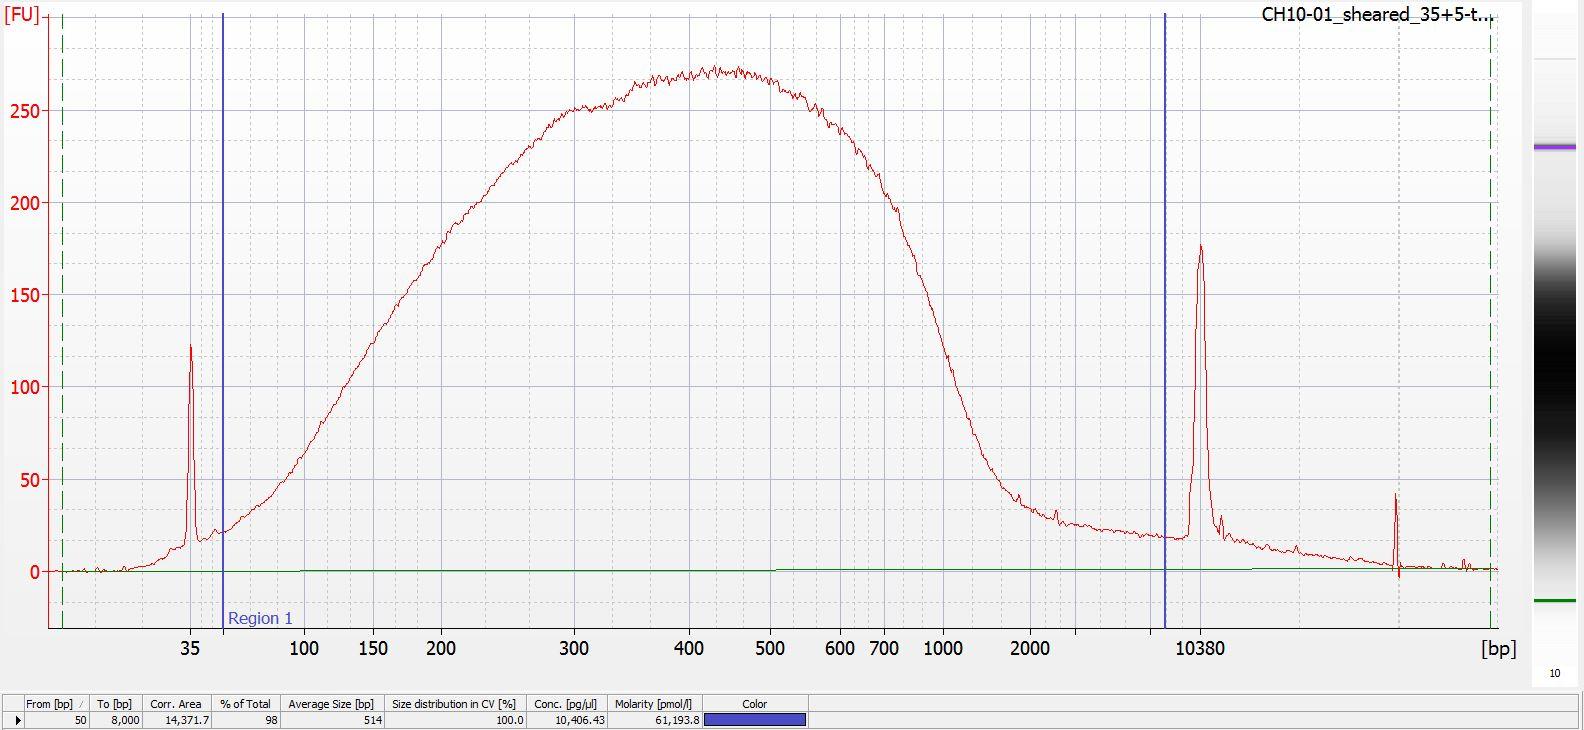 Sheared CH10-01 Bioanalyzer electropherogram